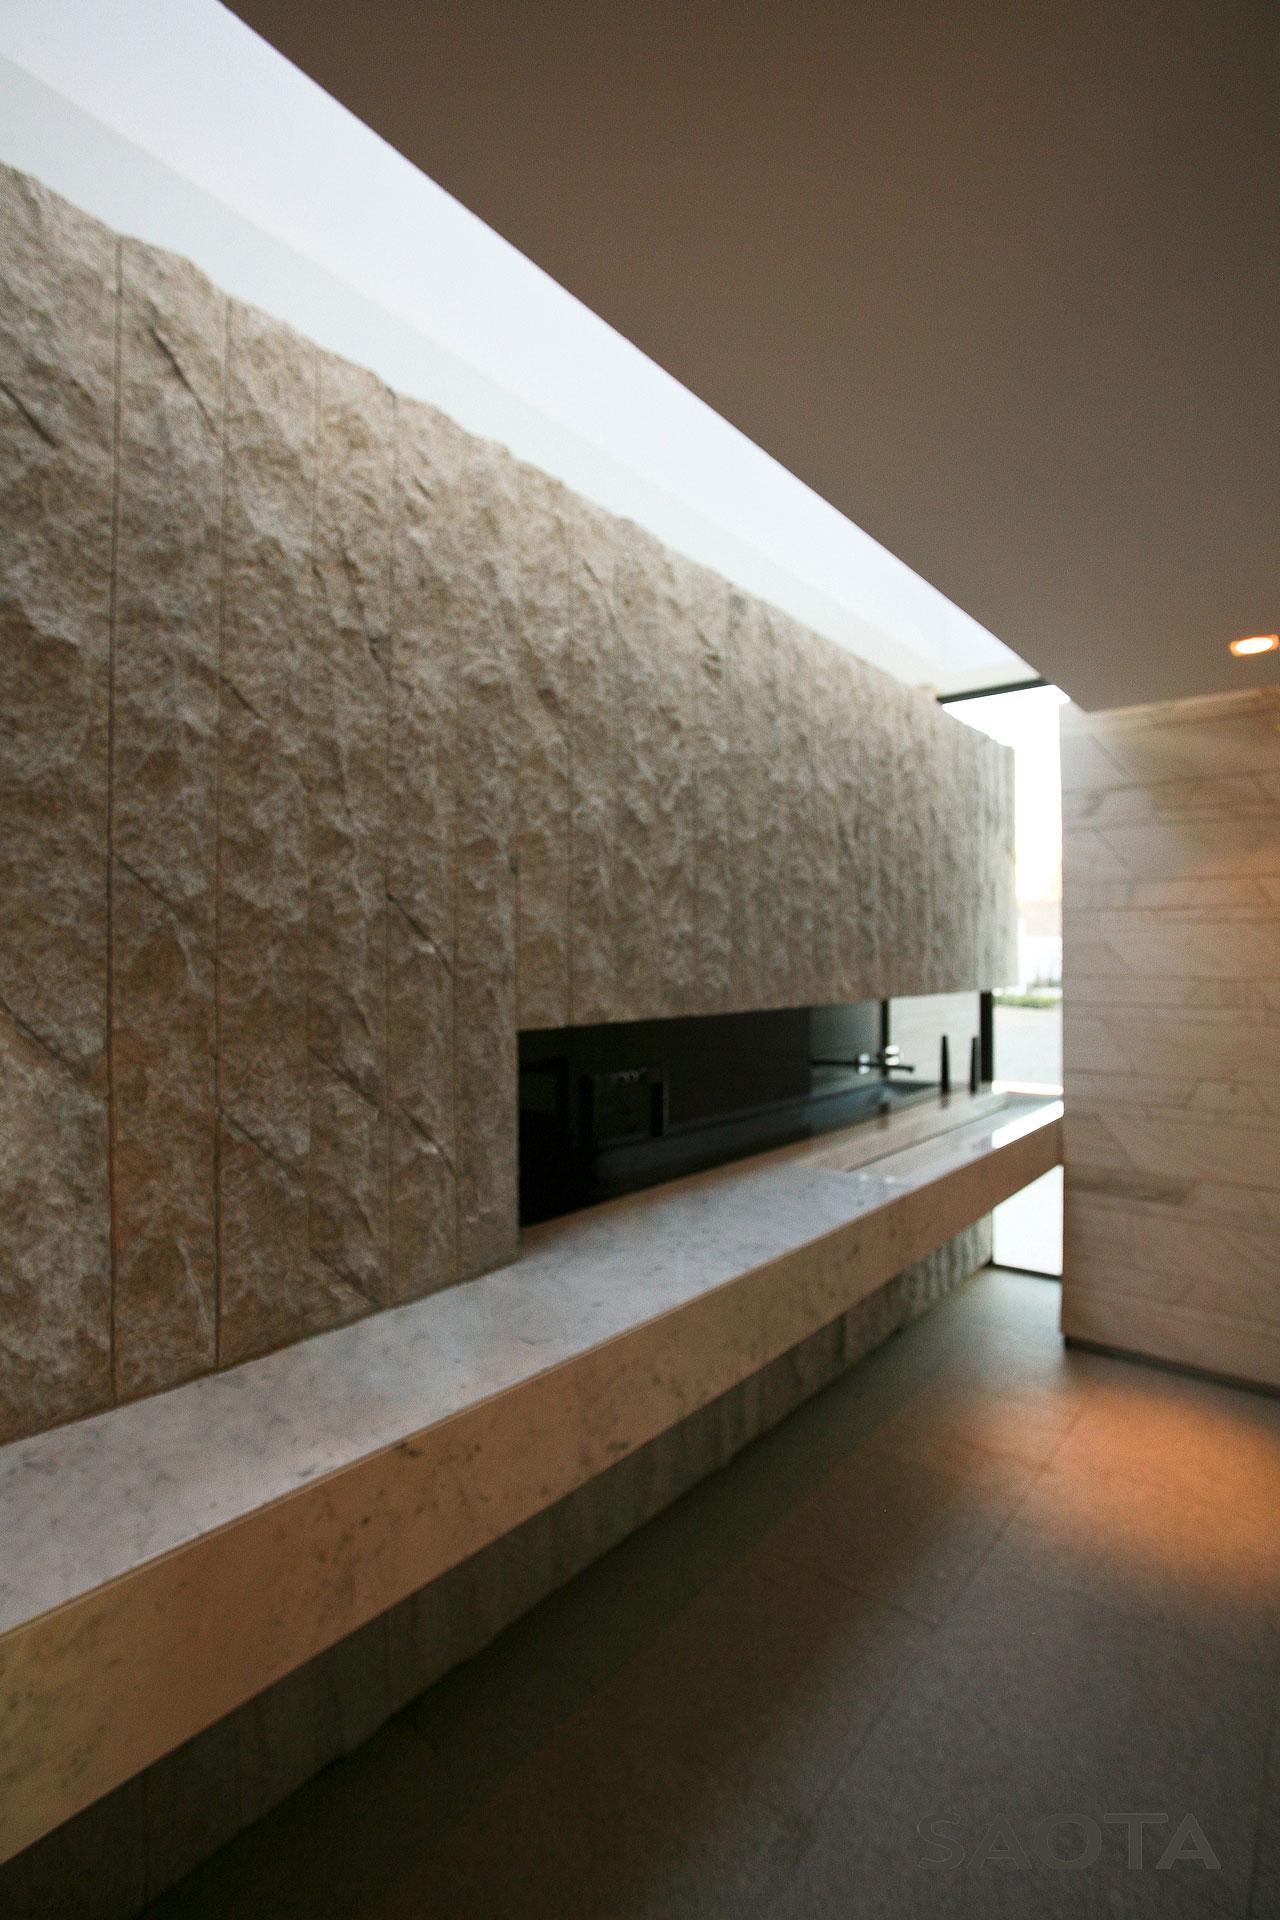 Futuristic House Where Contemporary Art Meets Modern Living